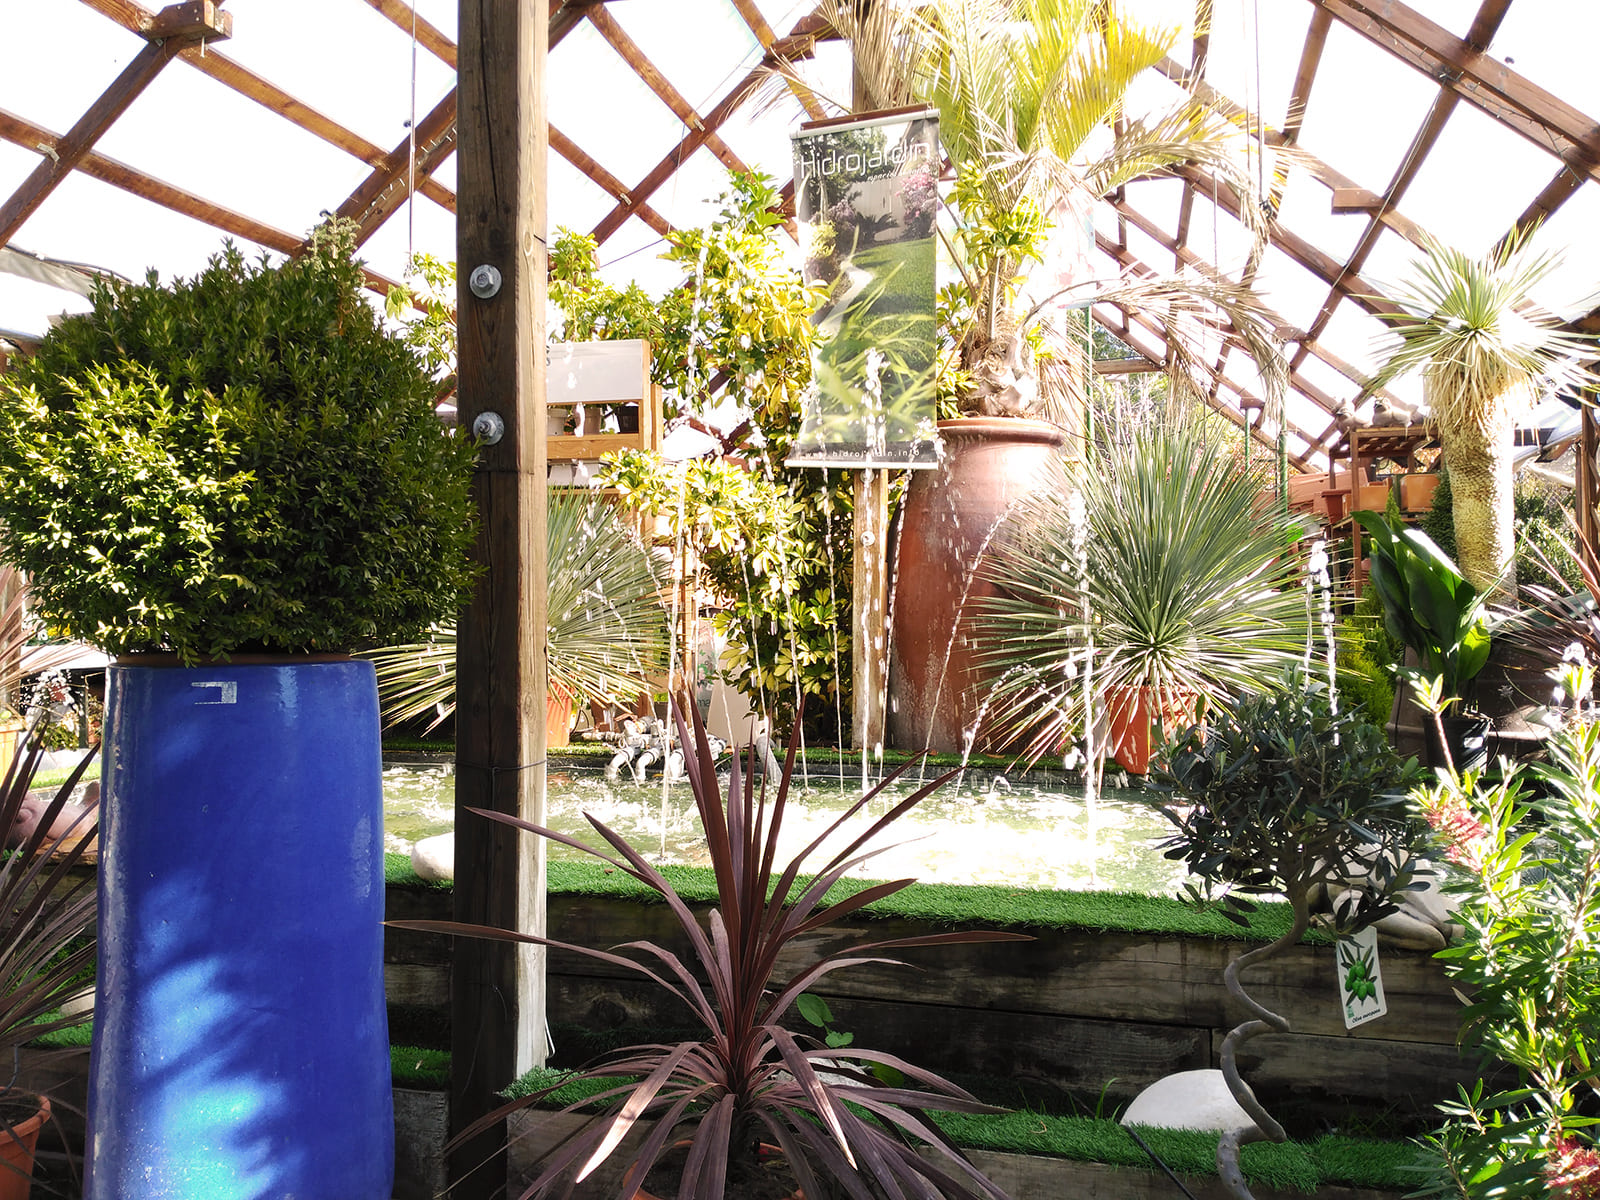 centro-jardineria-garden-invernadero-artesanal-madera-fuente-03_HIDROJARDIN-Bañeres